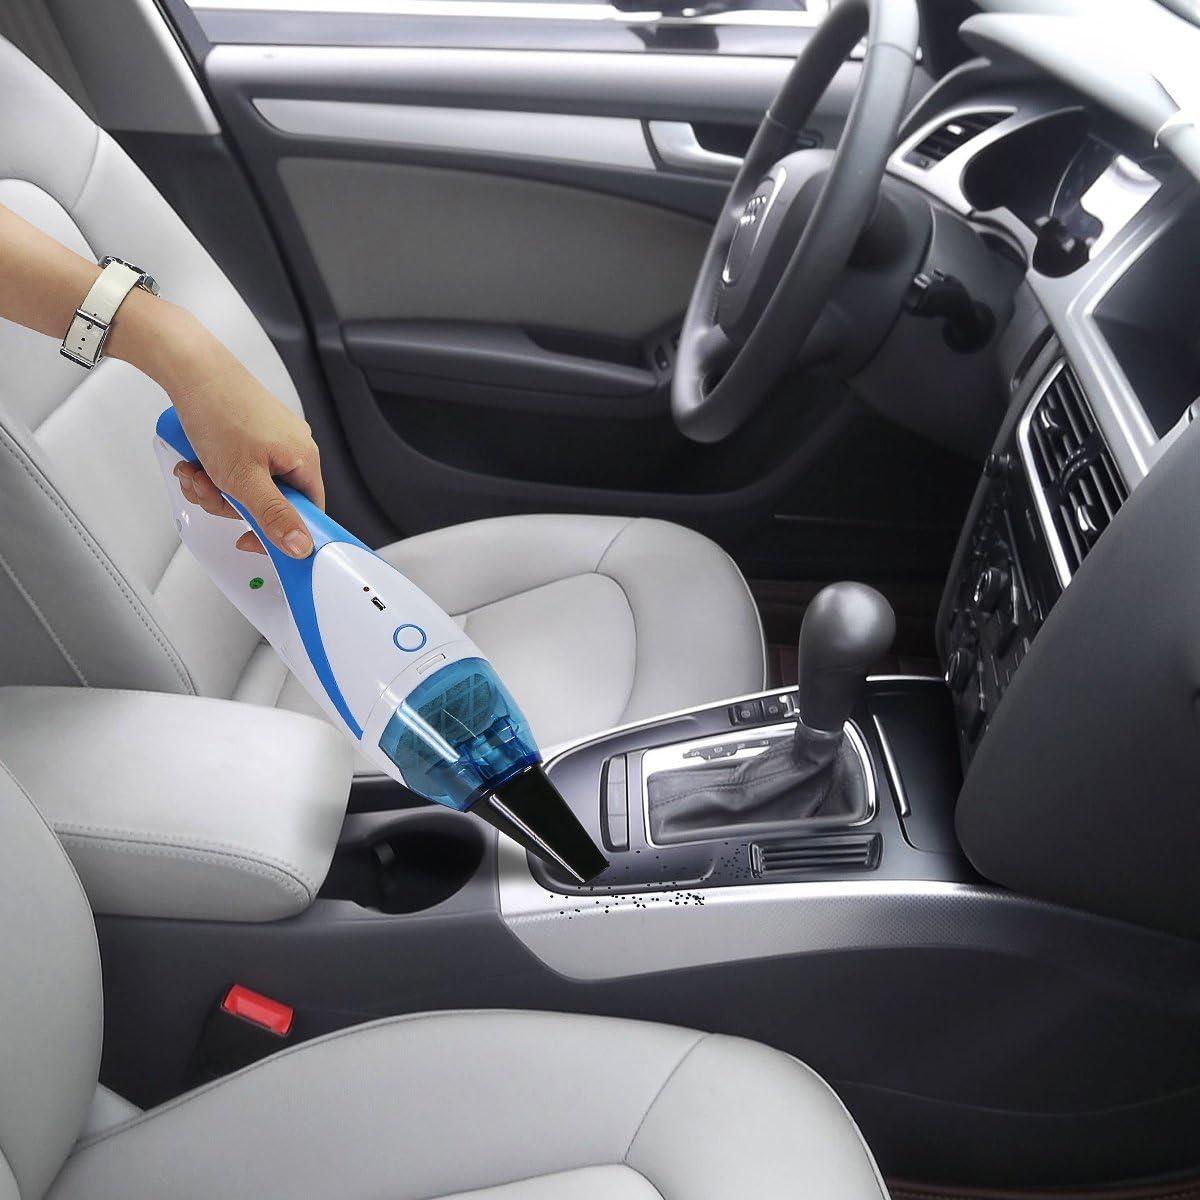 bleu voiture aspirateur sans sac grande force daspiration Aspirateur /à Main Batterie avec jusqu/à 25 minutes dautonomie 1500 PA Mini rangement Aspirateur